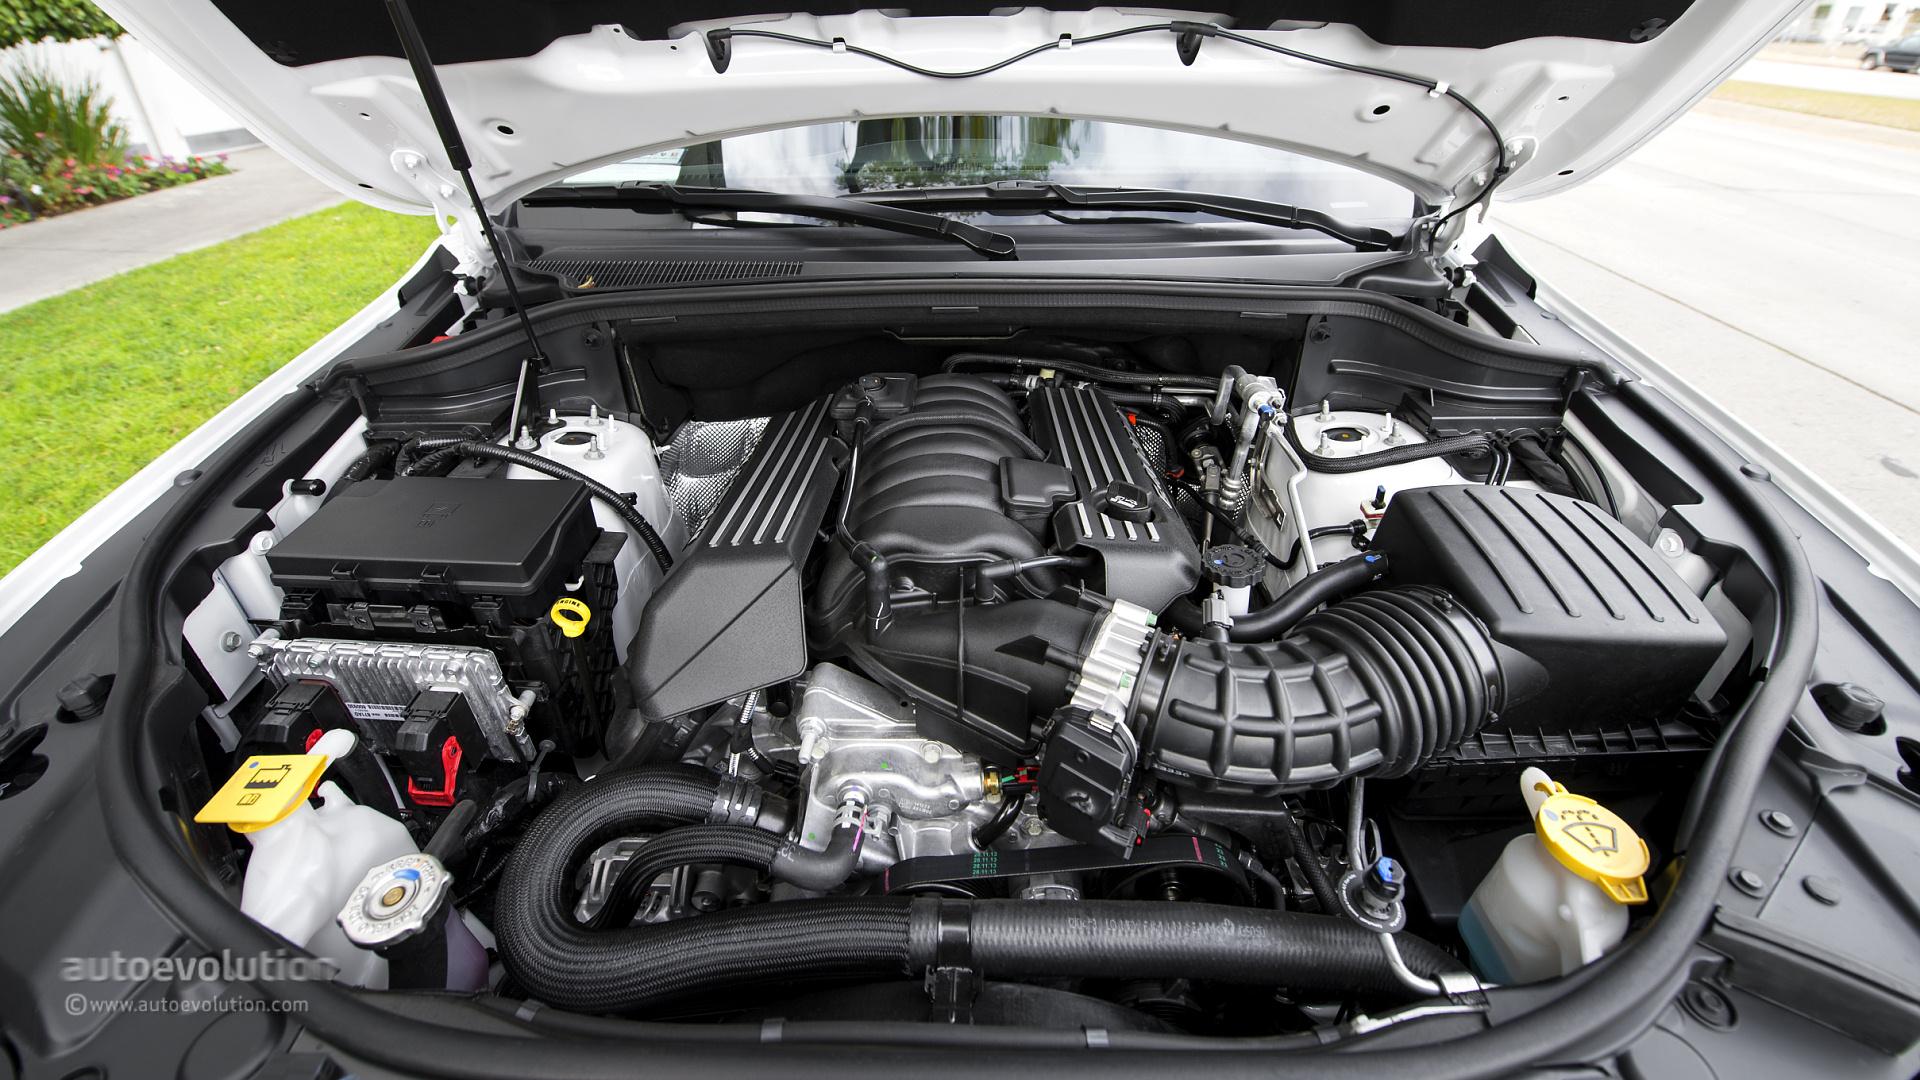 chrysler 3 6l engine review 2015 performance parts autos post. Black Bedroom Furniture Sets. Home Design Ideas